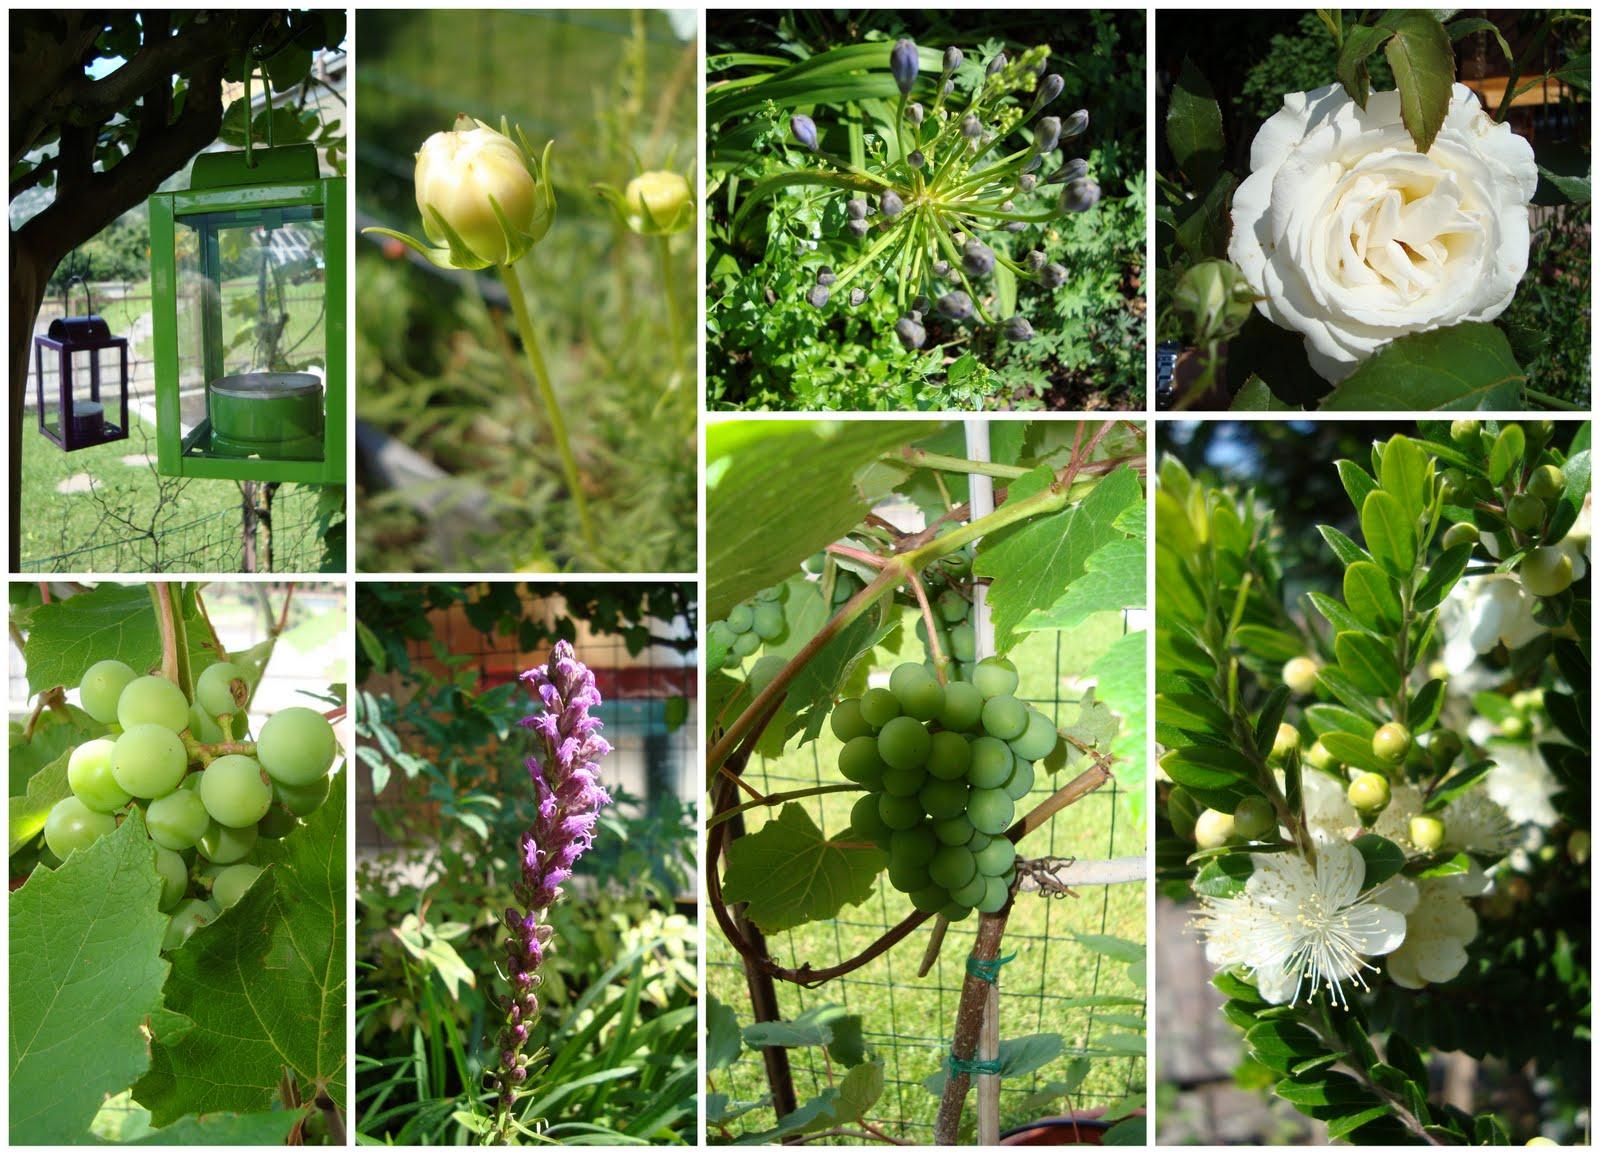 Fiore raro luglio 2011 for Fiori verdi